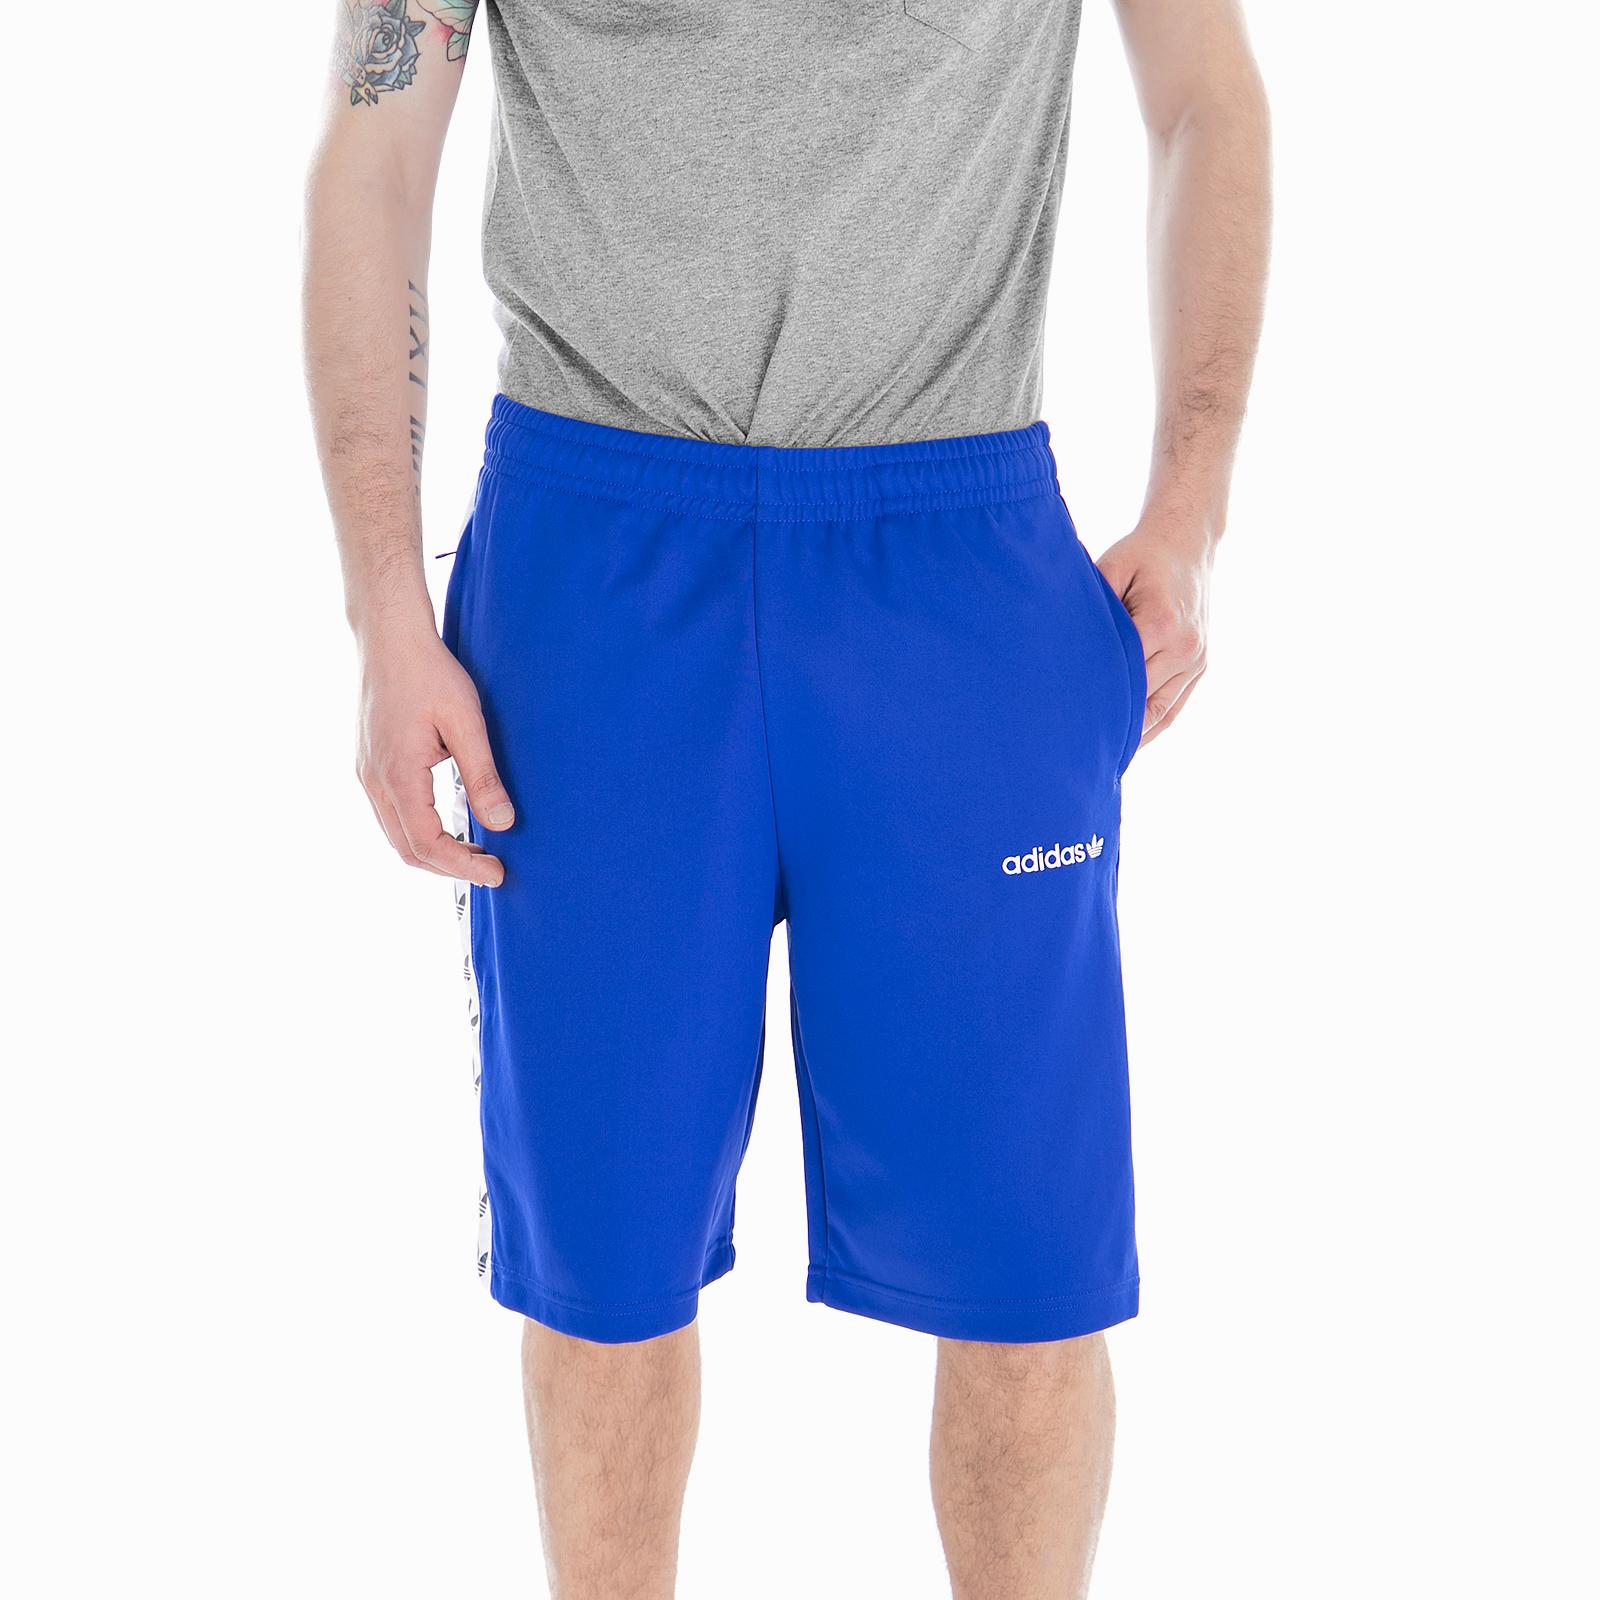 ab63979f513b9 Adidas Shorts Tnt White bluee Bobluee Short ntvjrn24062-Shorts - www ...